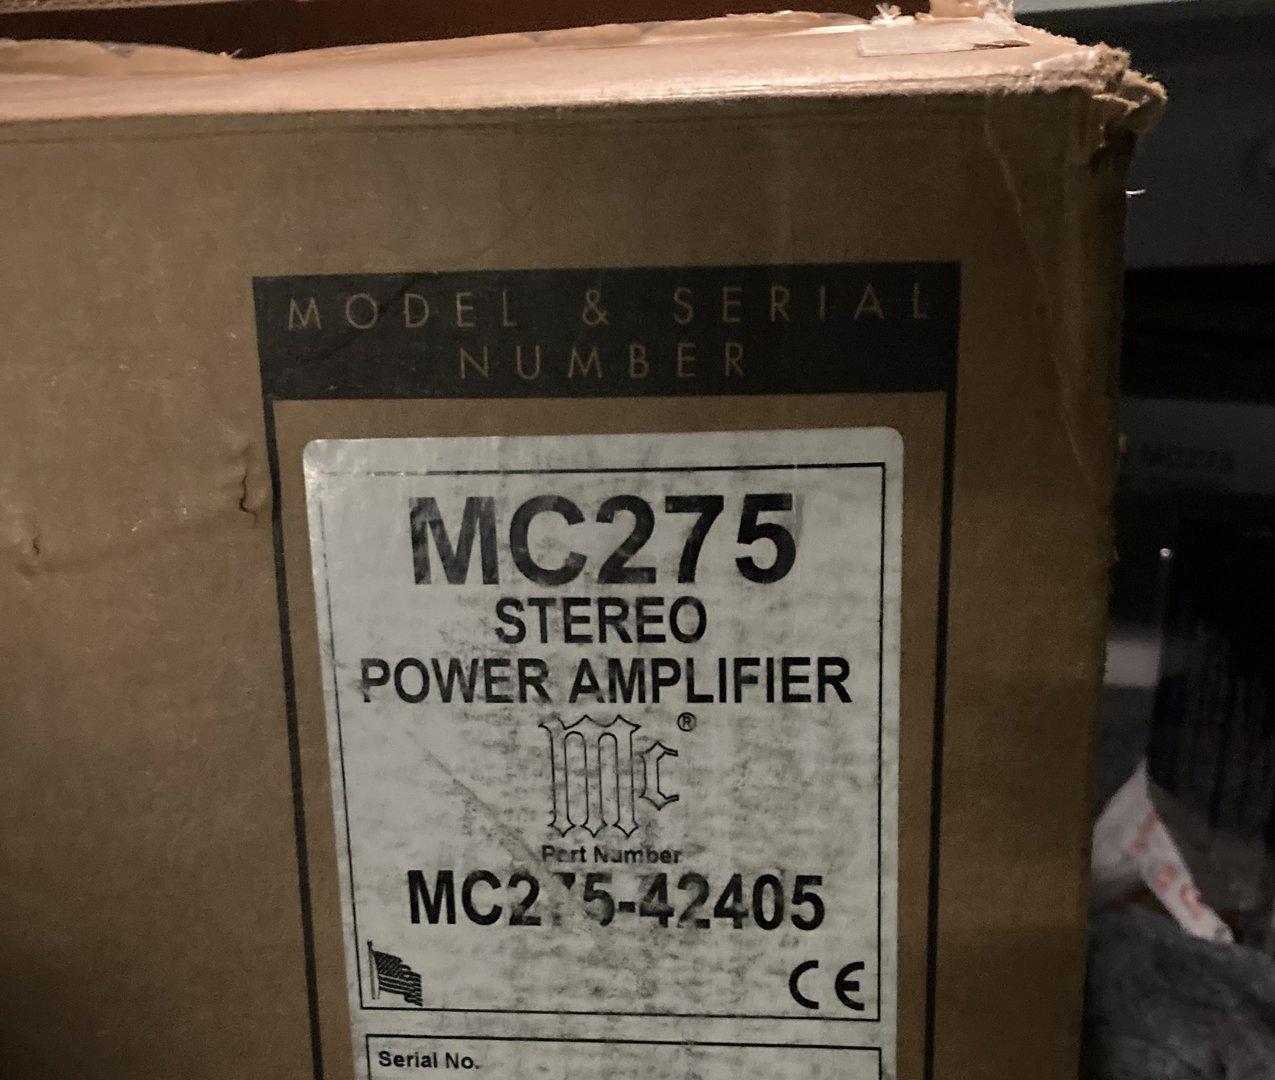 D4773360-48B4-4F30-8D14-B5133D1F8CEC.jpeg